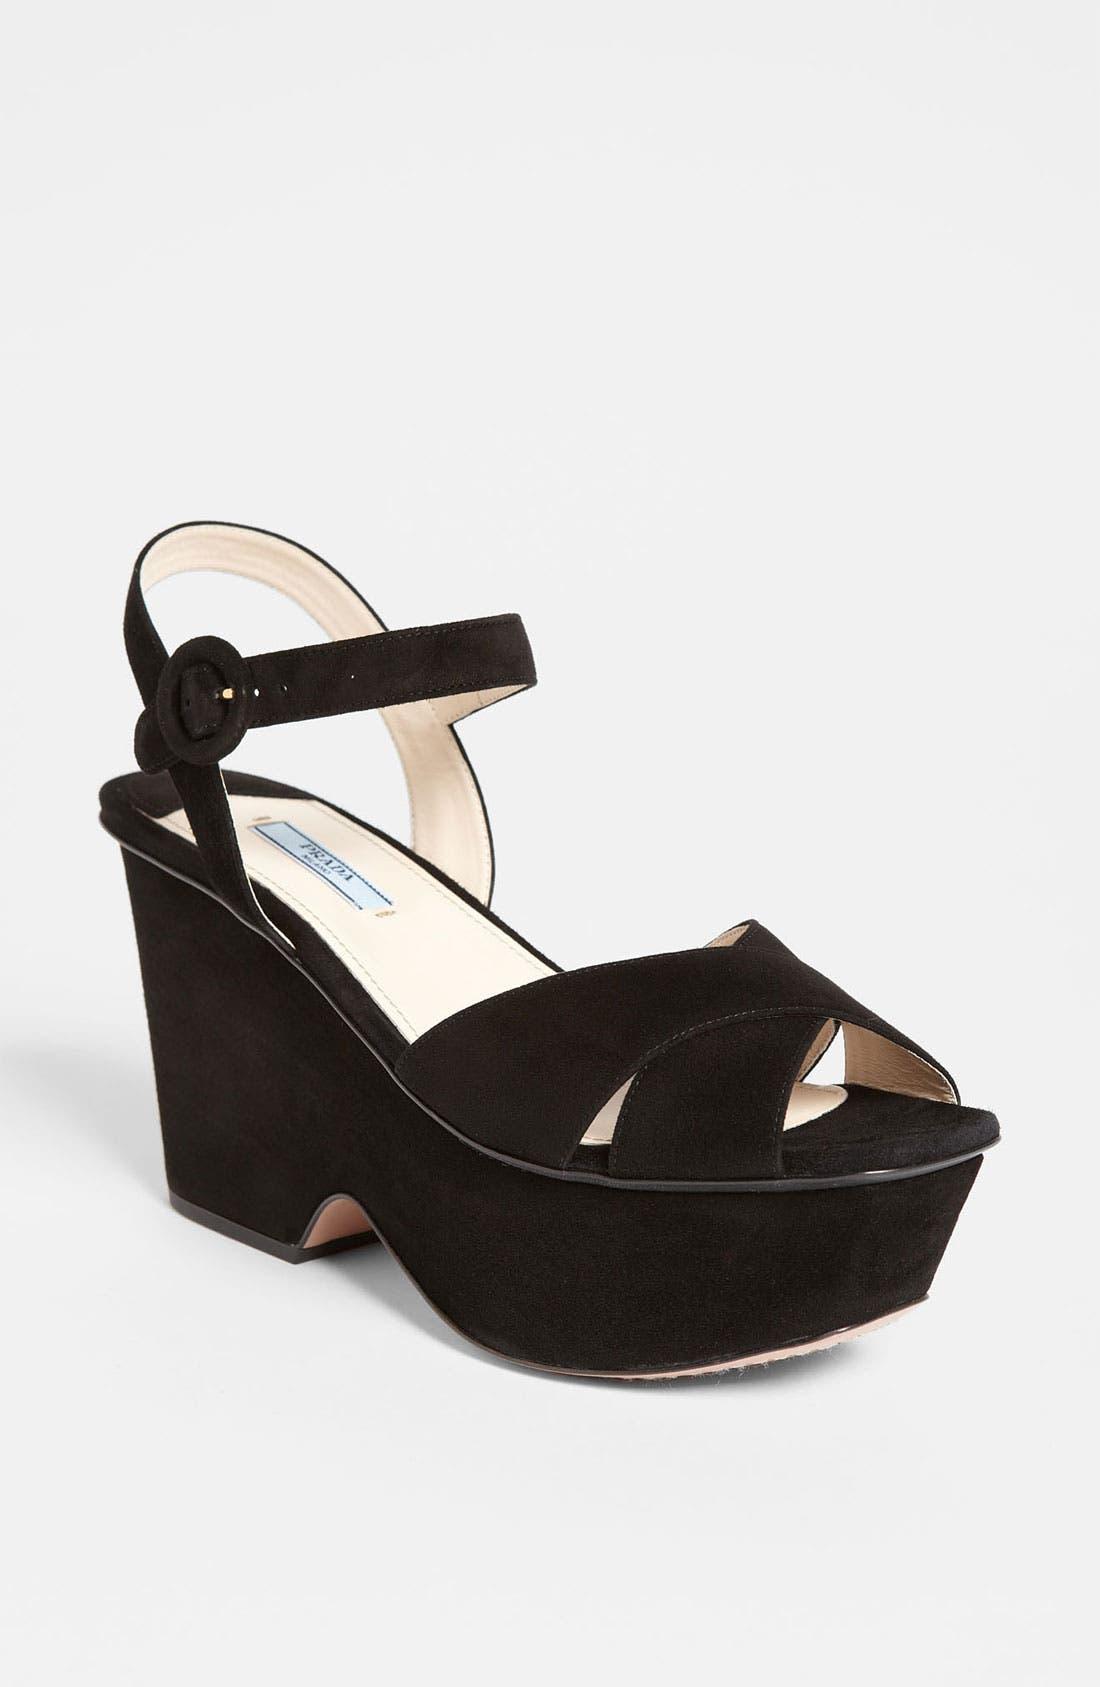 Alternate Image 1 Selected - Prada Suede Wedge Sandal